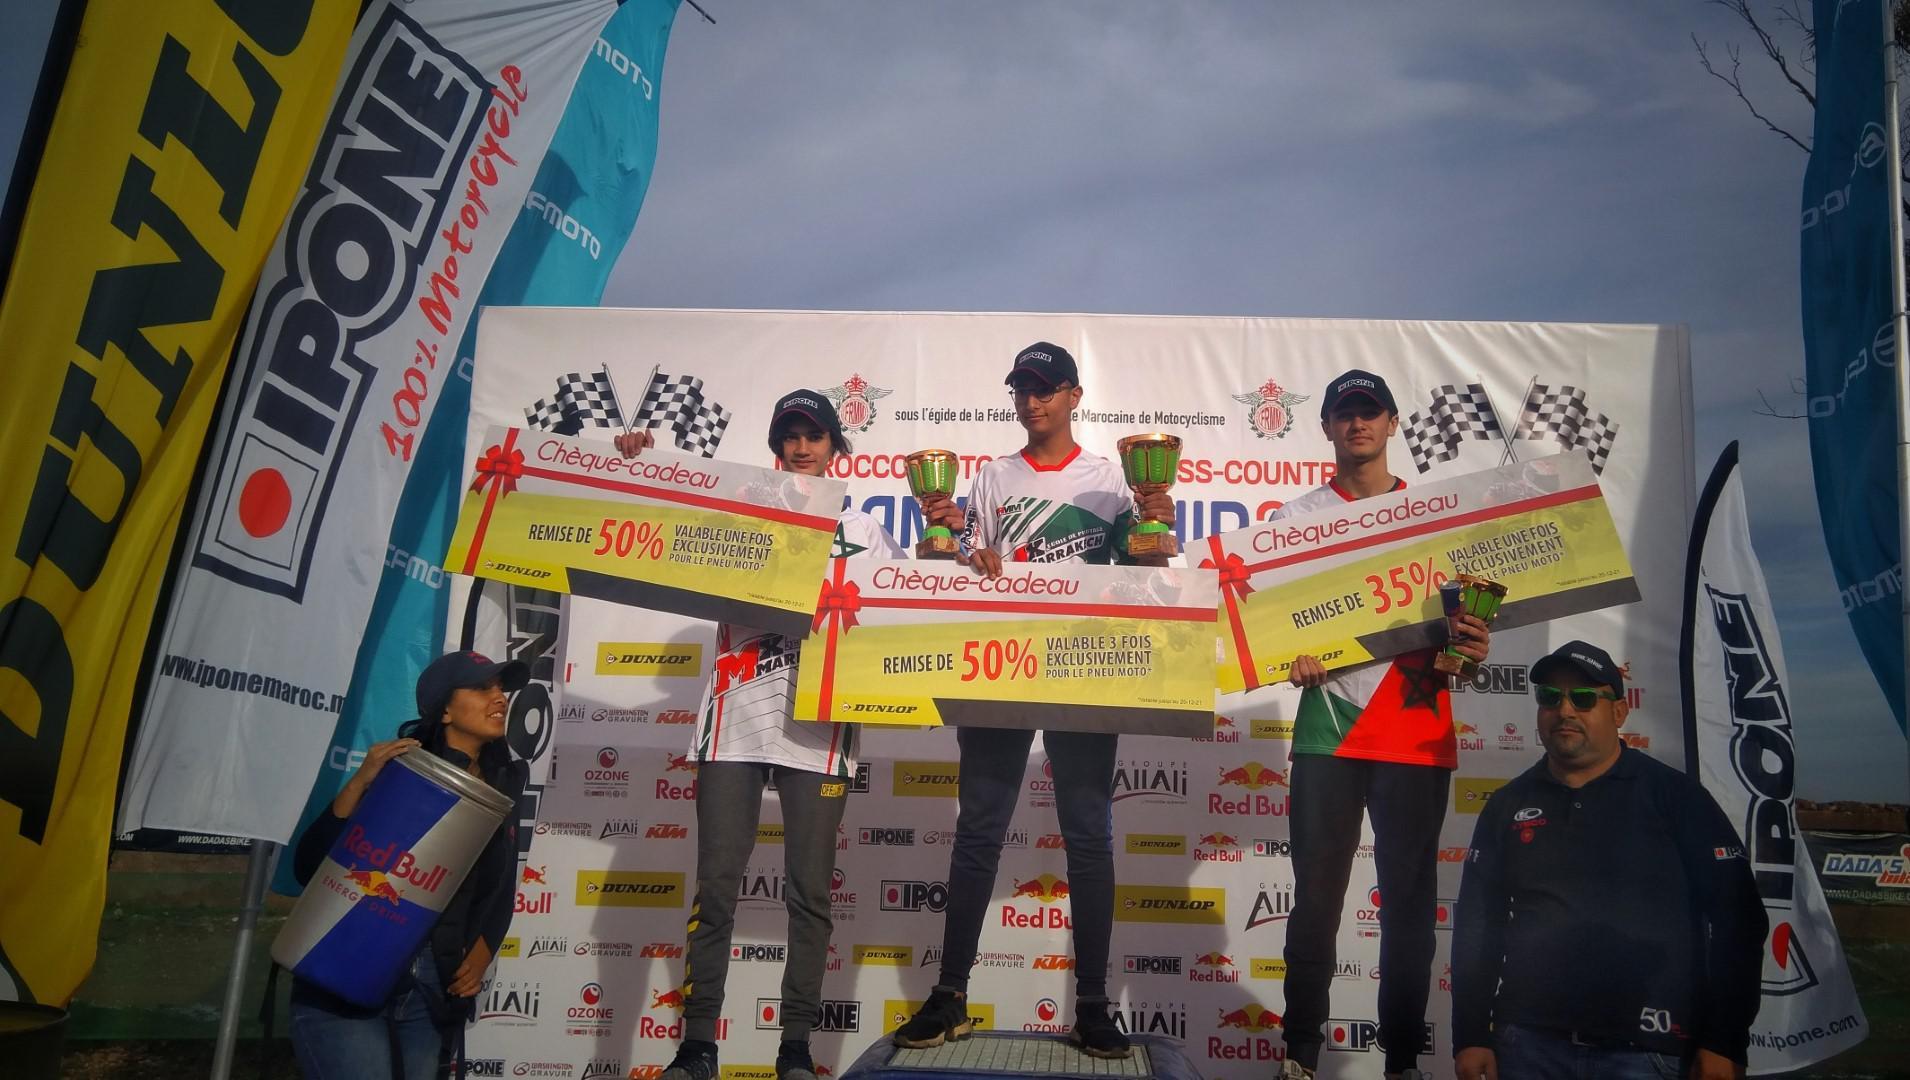 finale-du-championnat-du-maroc-de-motocross-et-cross-country-1164-3.jpg